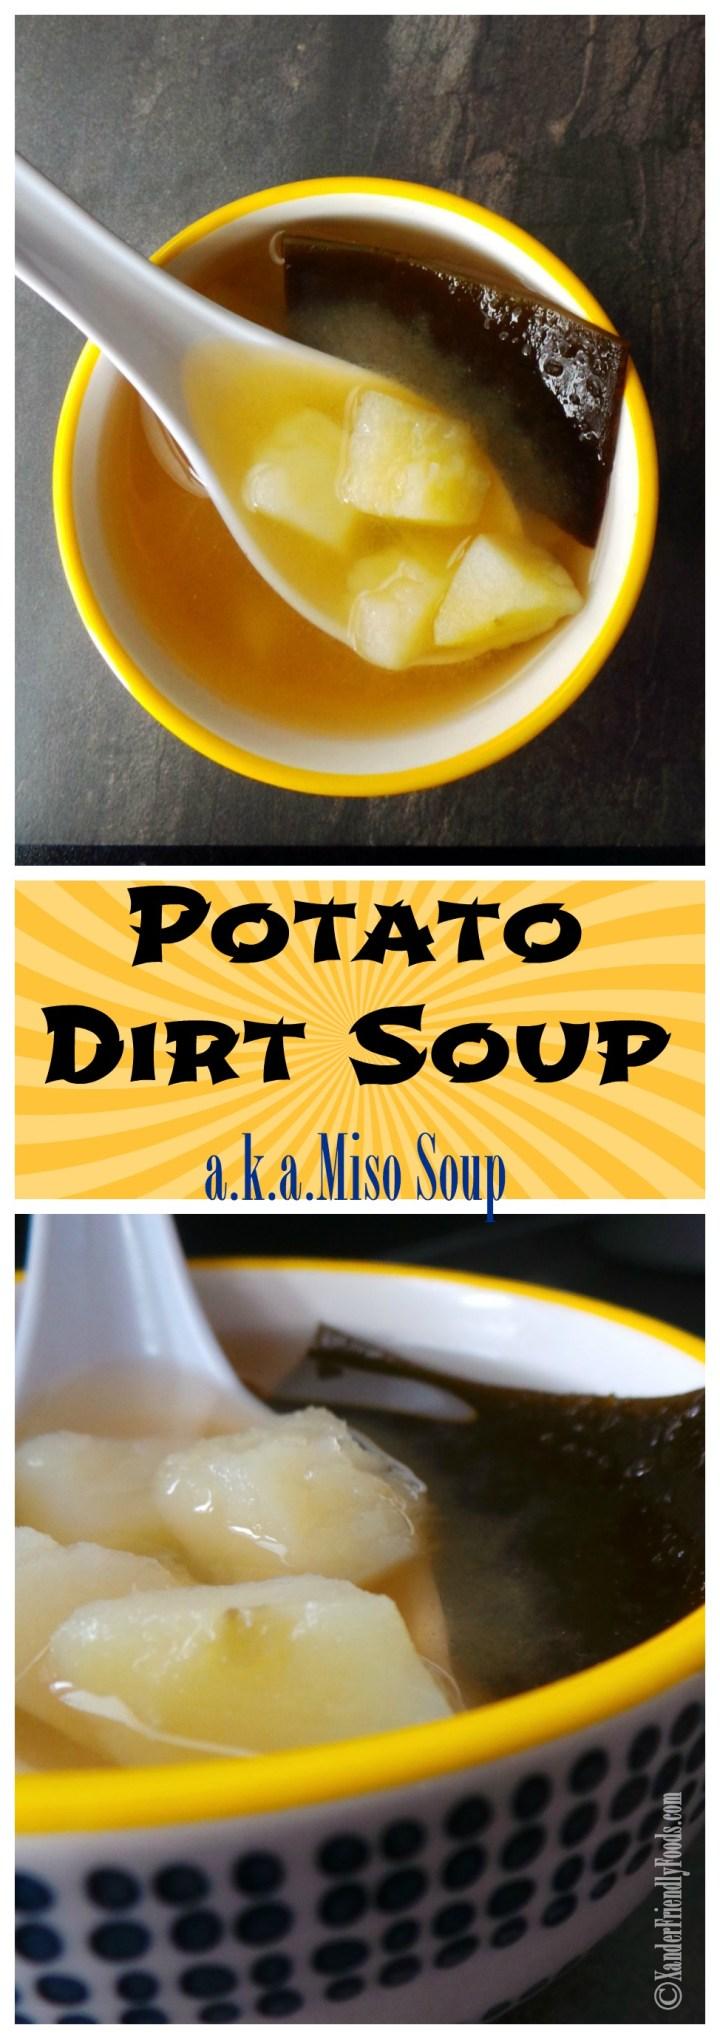 Dirt Soup Collage